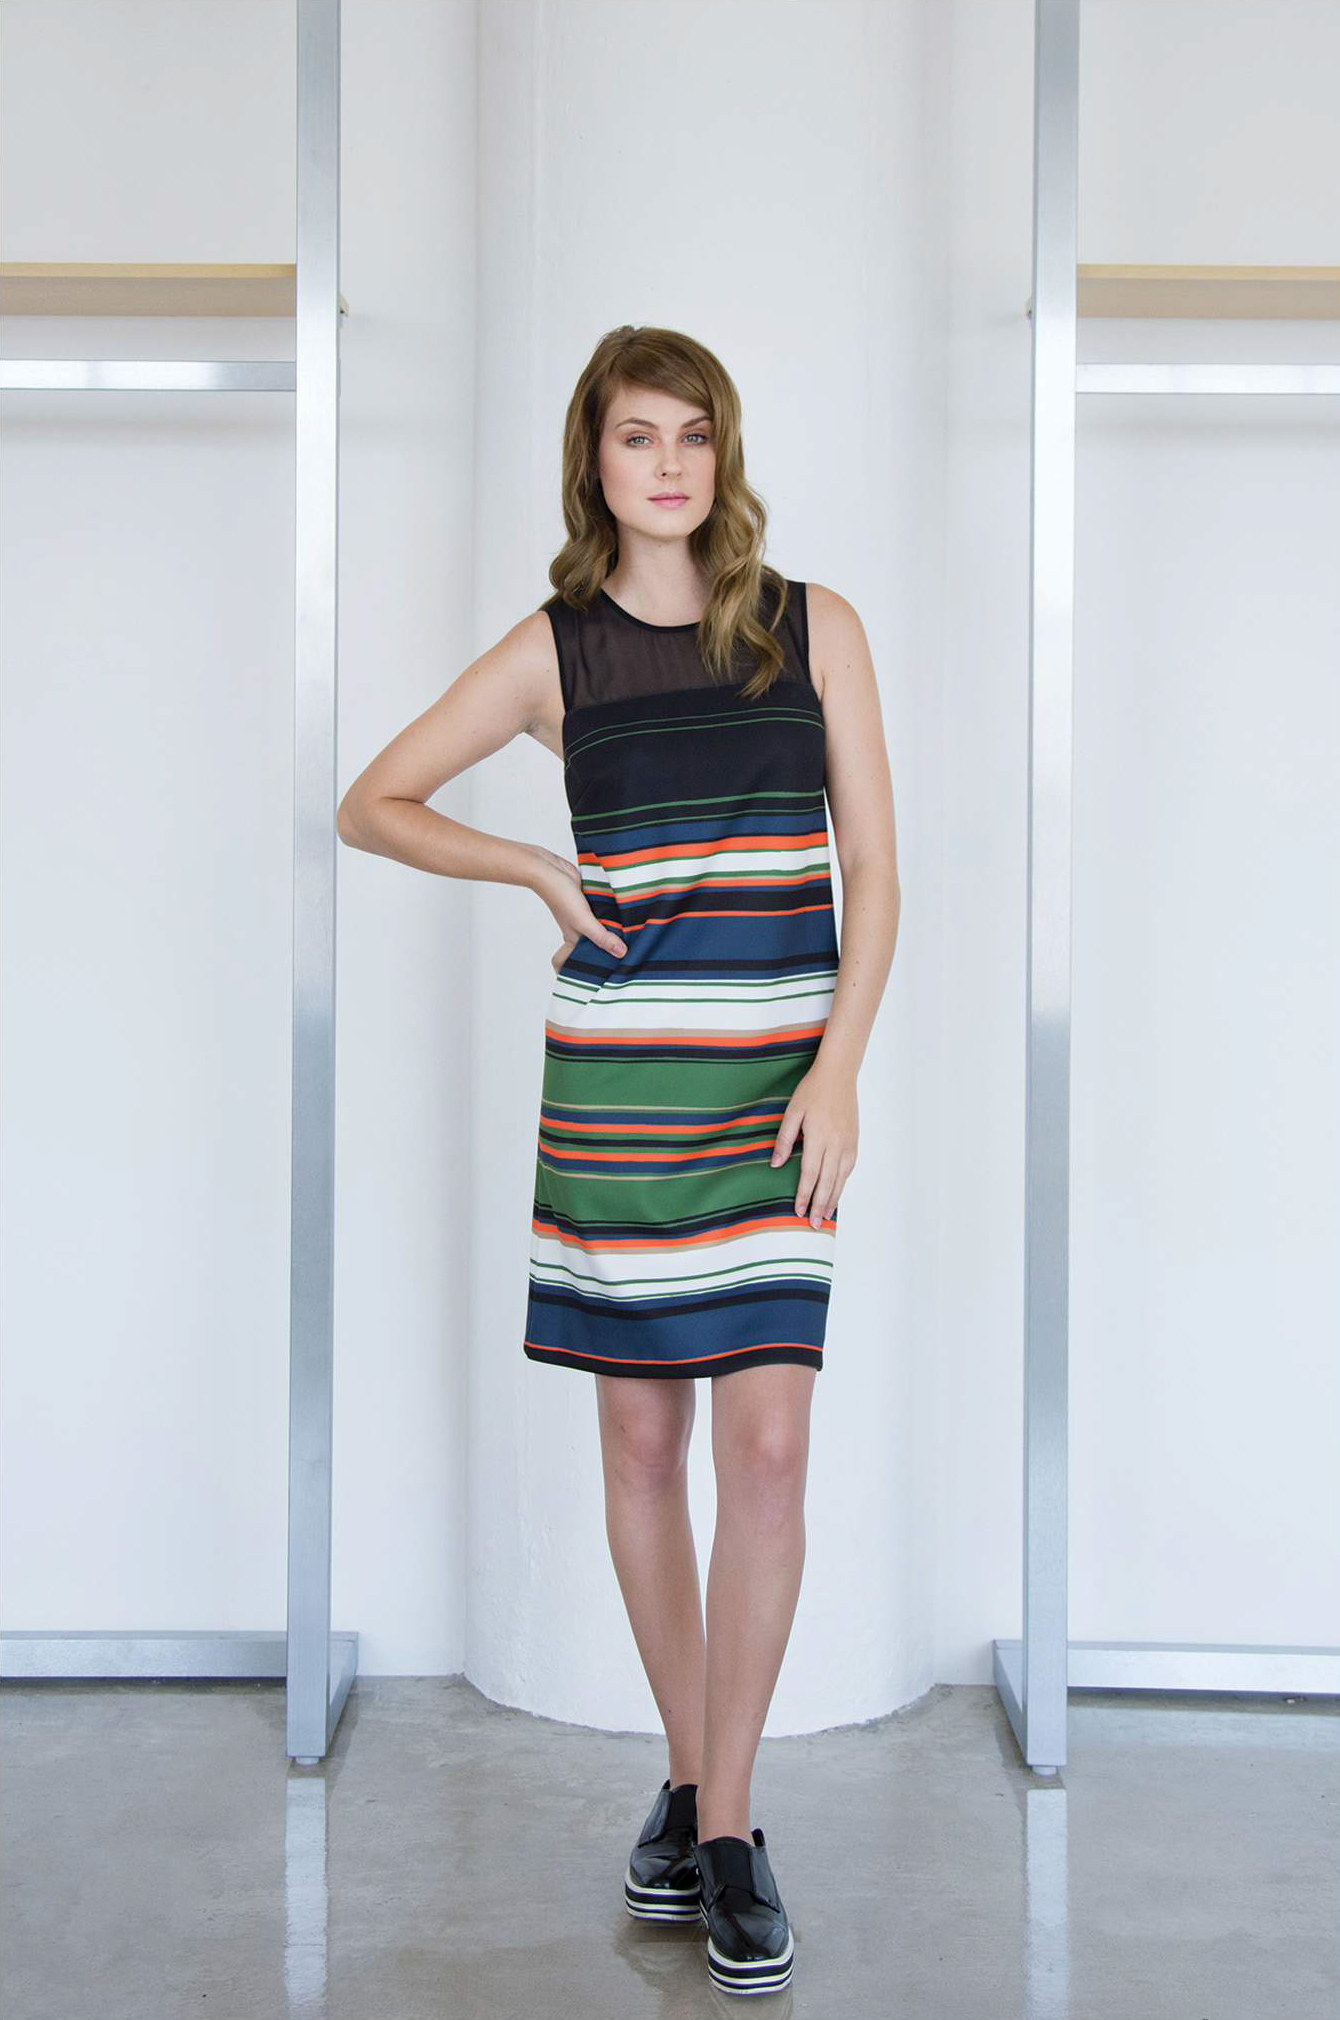 Dress: Rica 1 - SANTORELLI